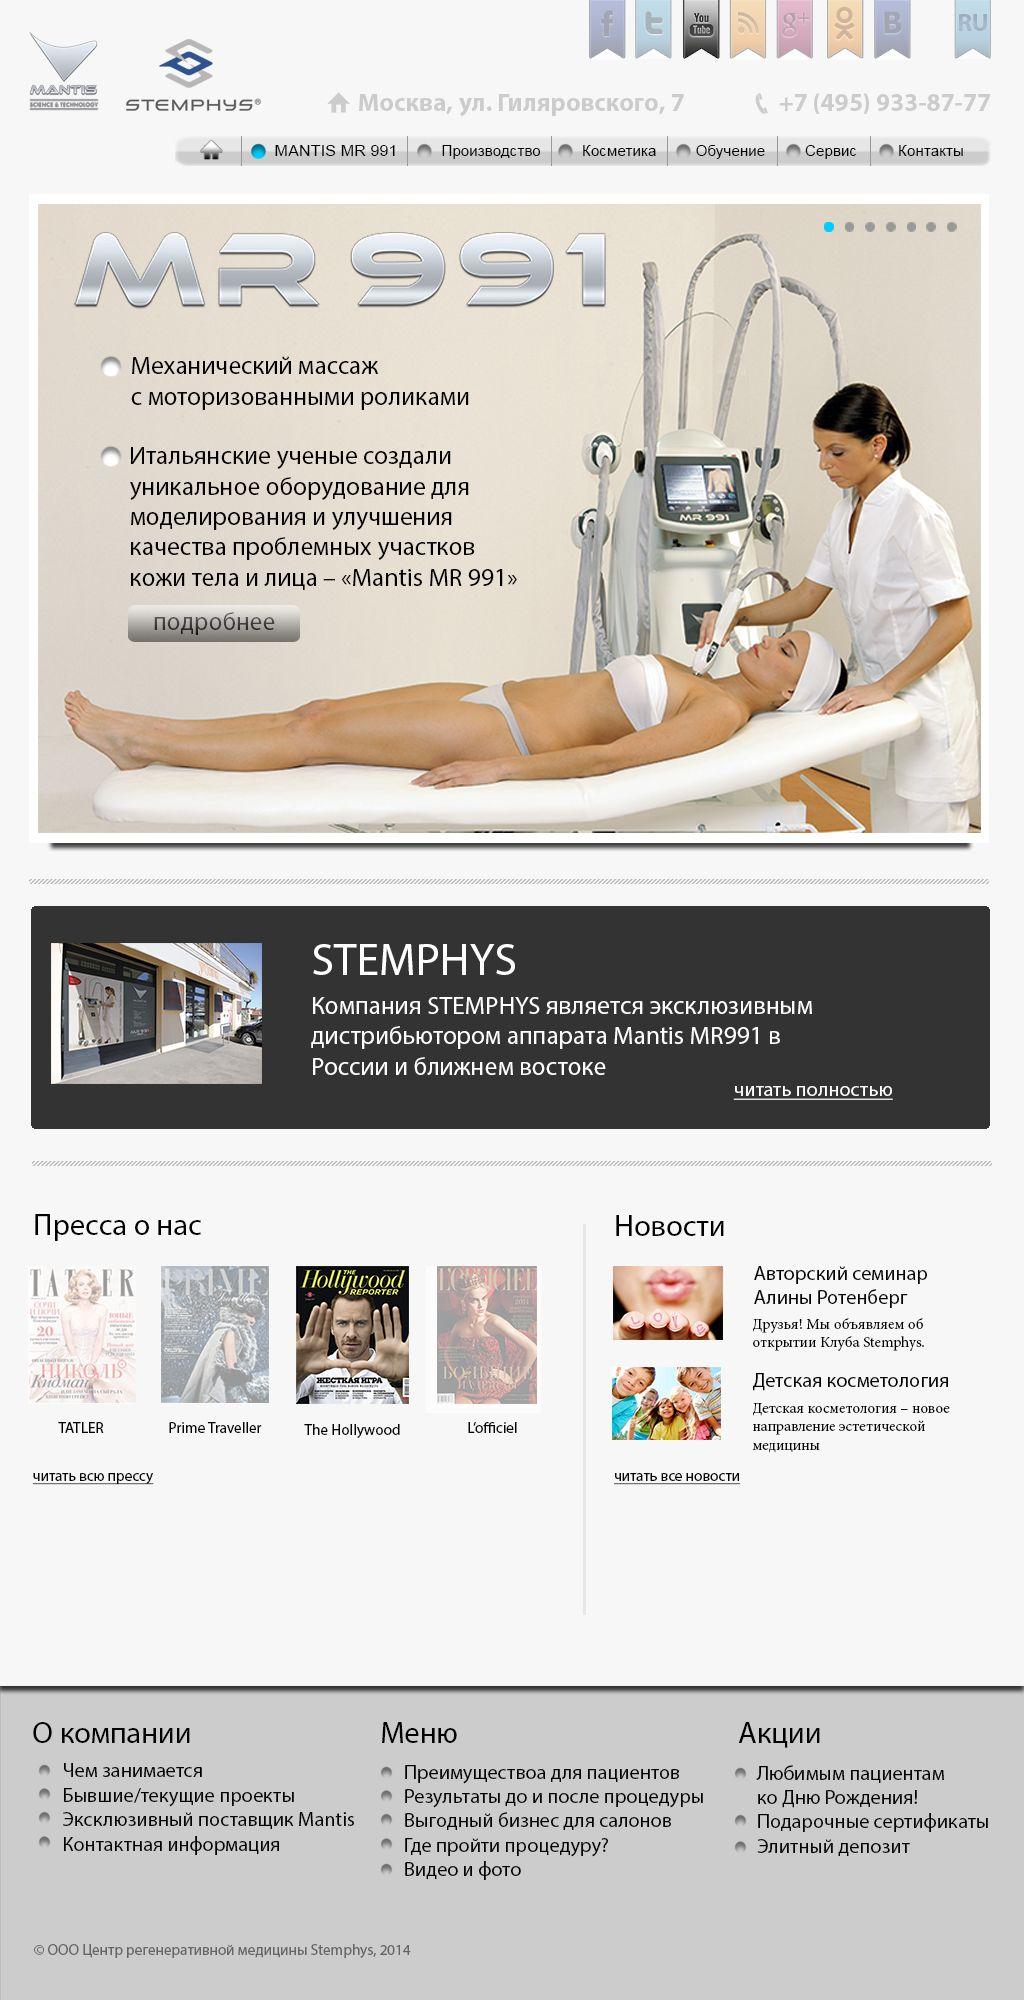 Создание рекламного сайта медицинского аппарата - дизайнер MakcPetrov